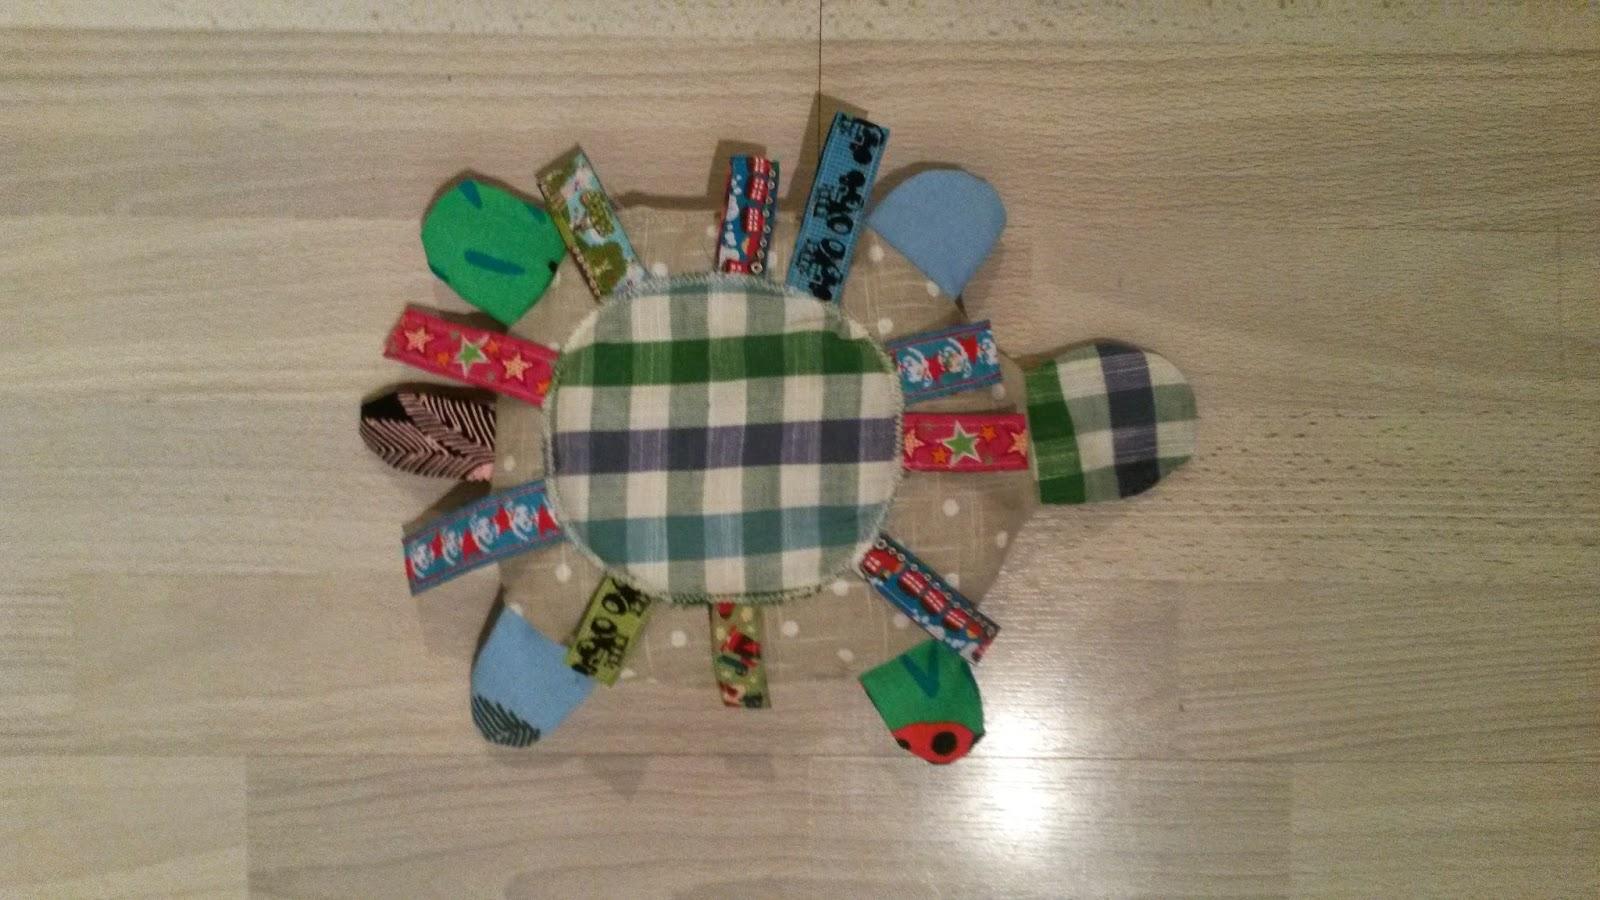 sköldpadda sy bebis pillerband leksak mjukdjur dopgåva